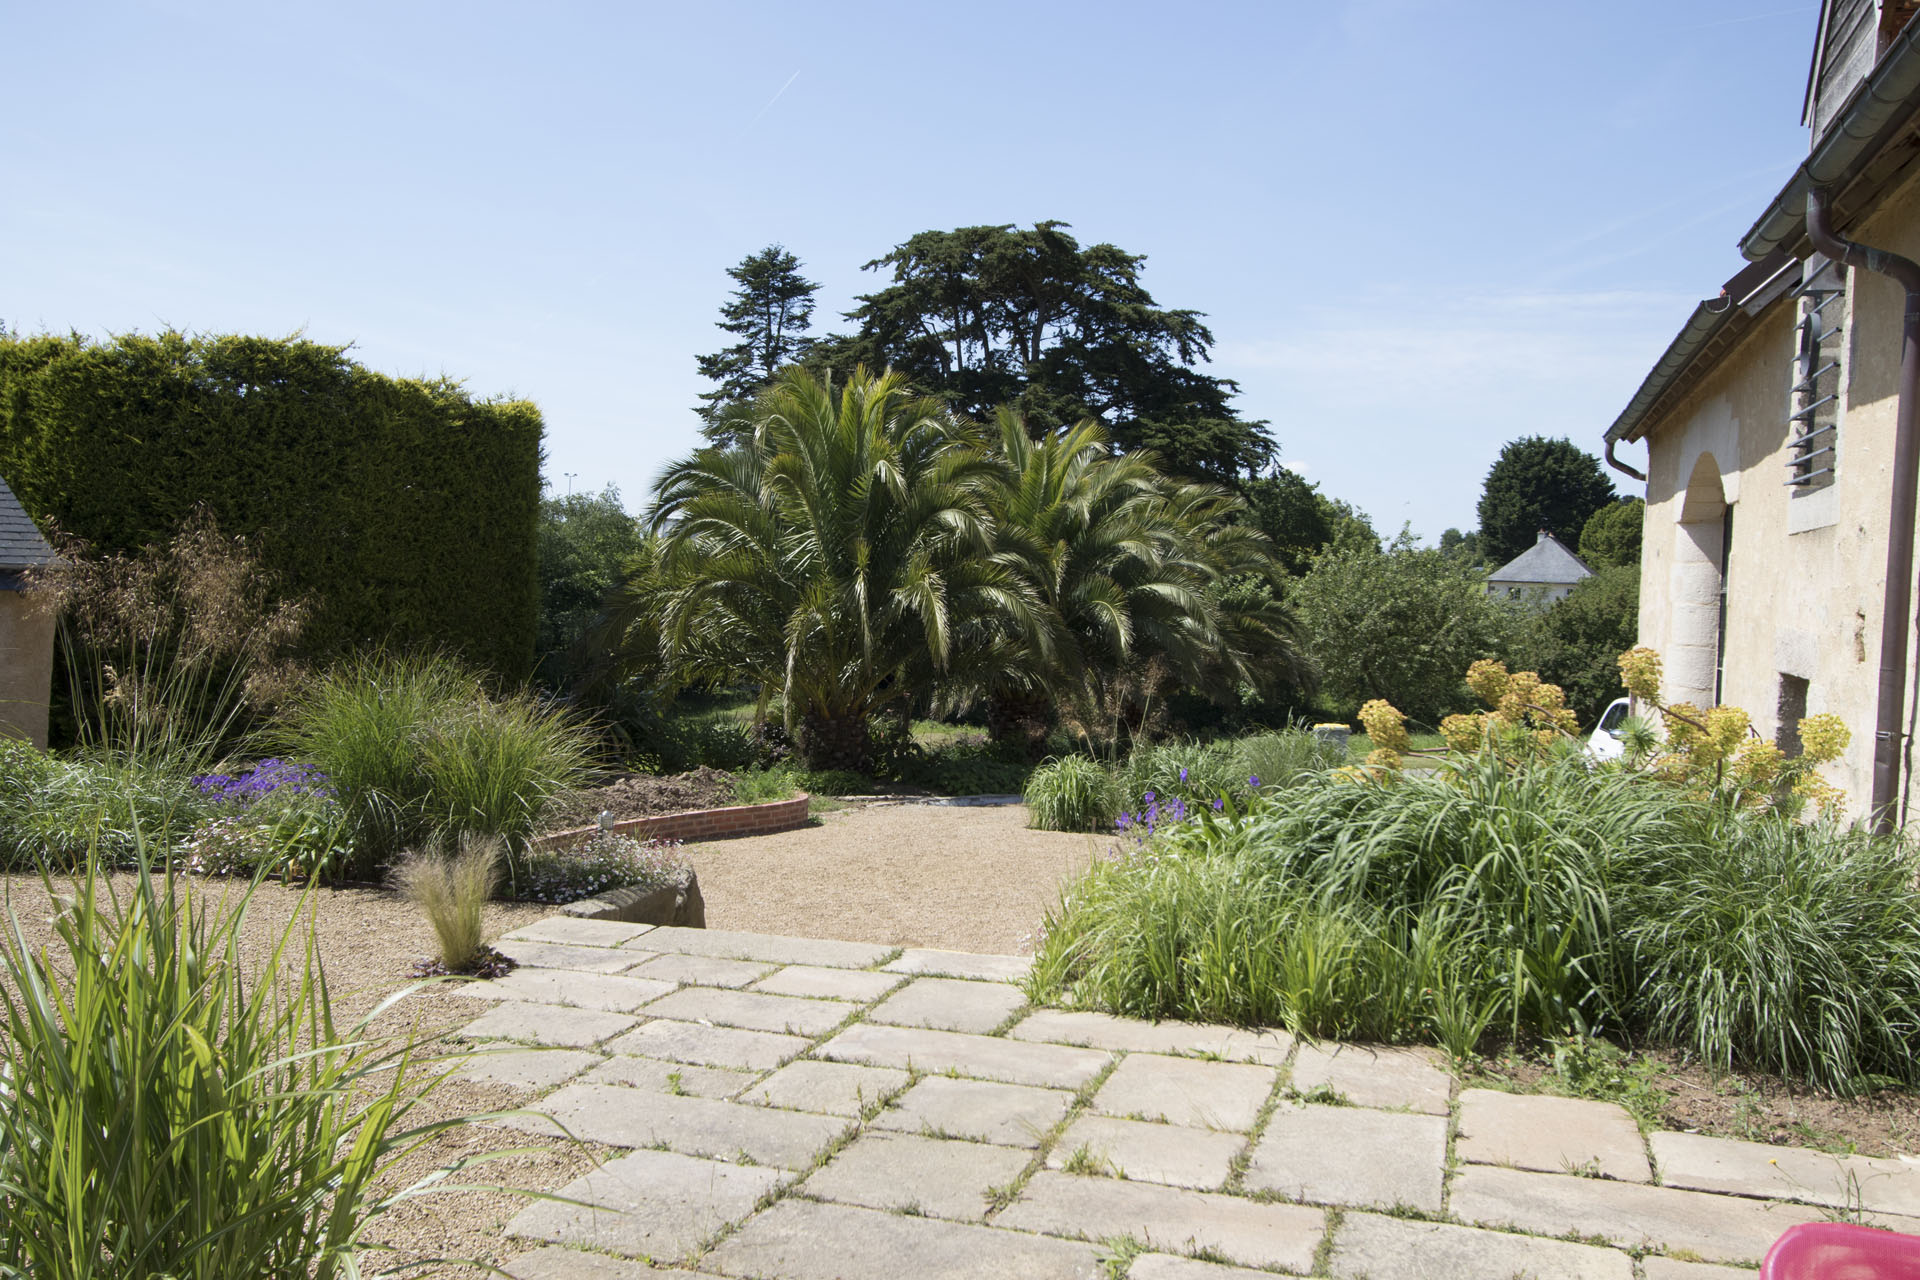 Paysagiste lannion plans de jardin with paysagiste for Paysagiste tarif